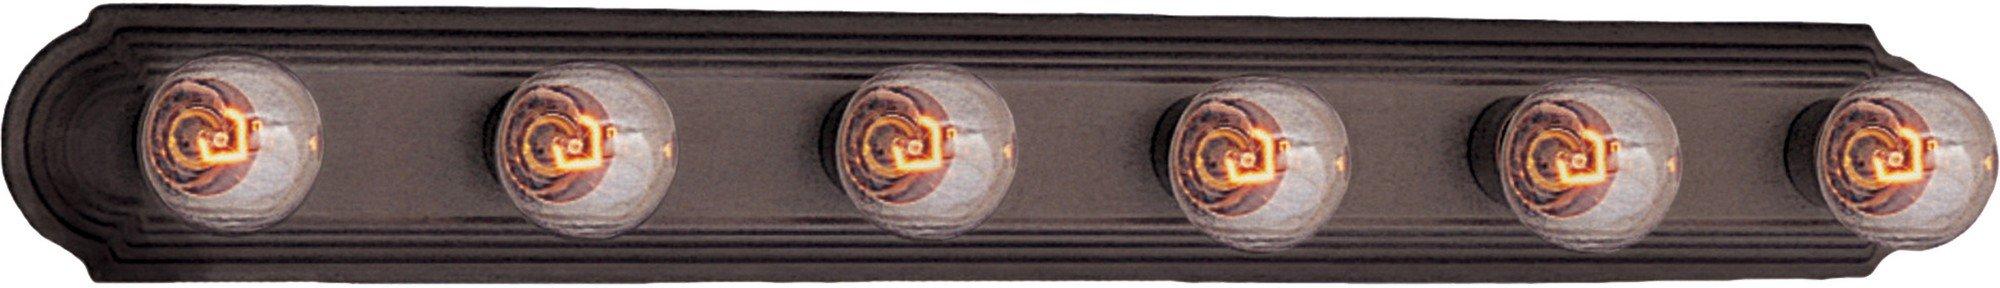 Maxim 7126OI 6-Light Bath Vanity - Oil Rubbed Bronze Bath Fixture, Vanity Light Strip, Antique Bath Light. Home Decor Lighting